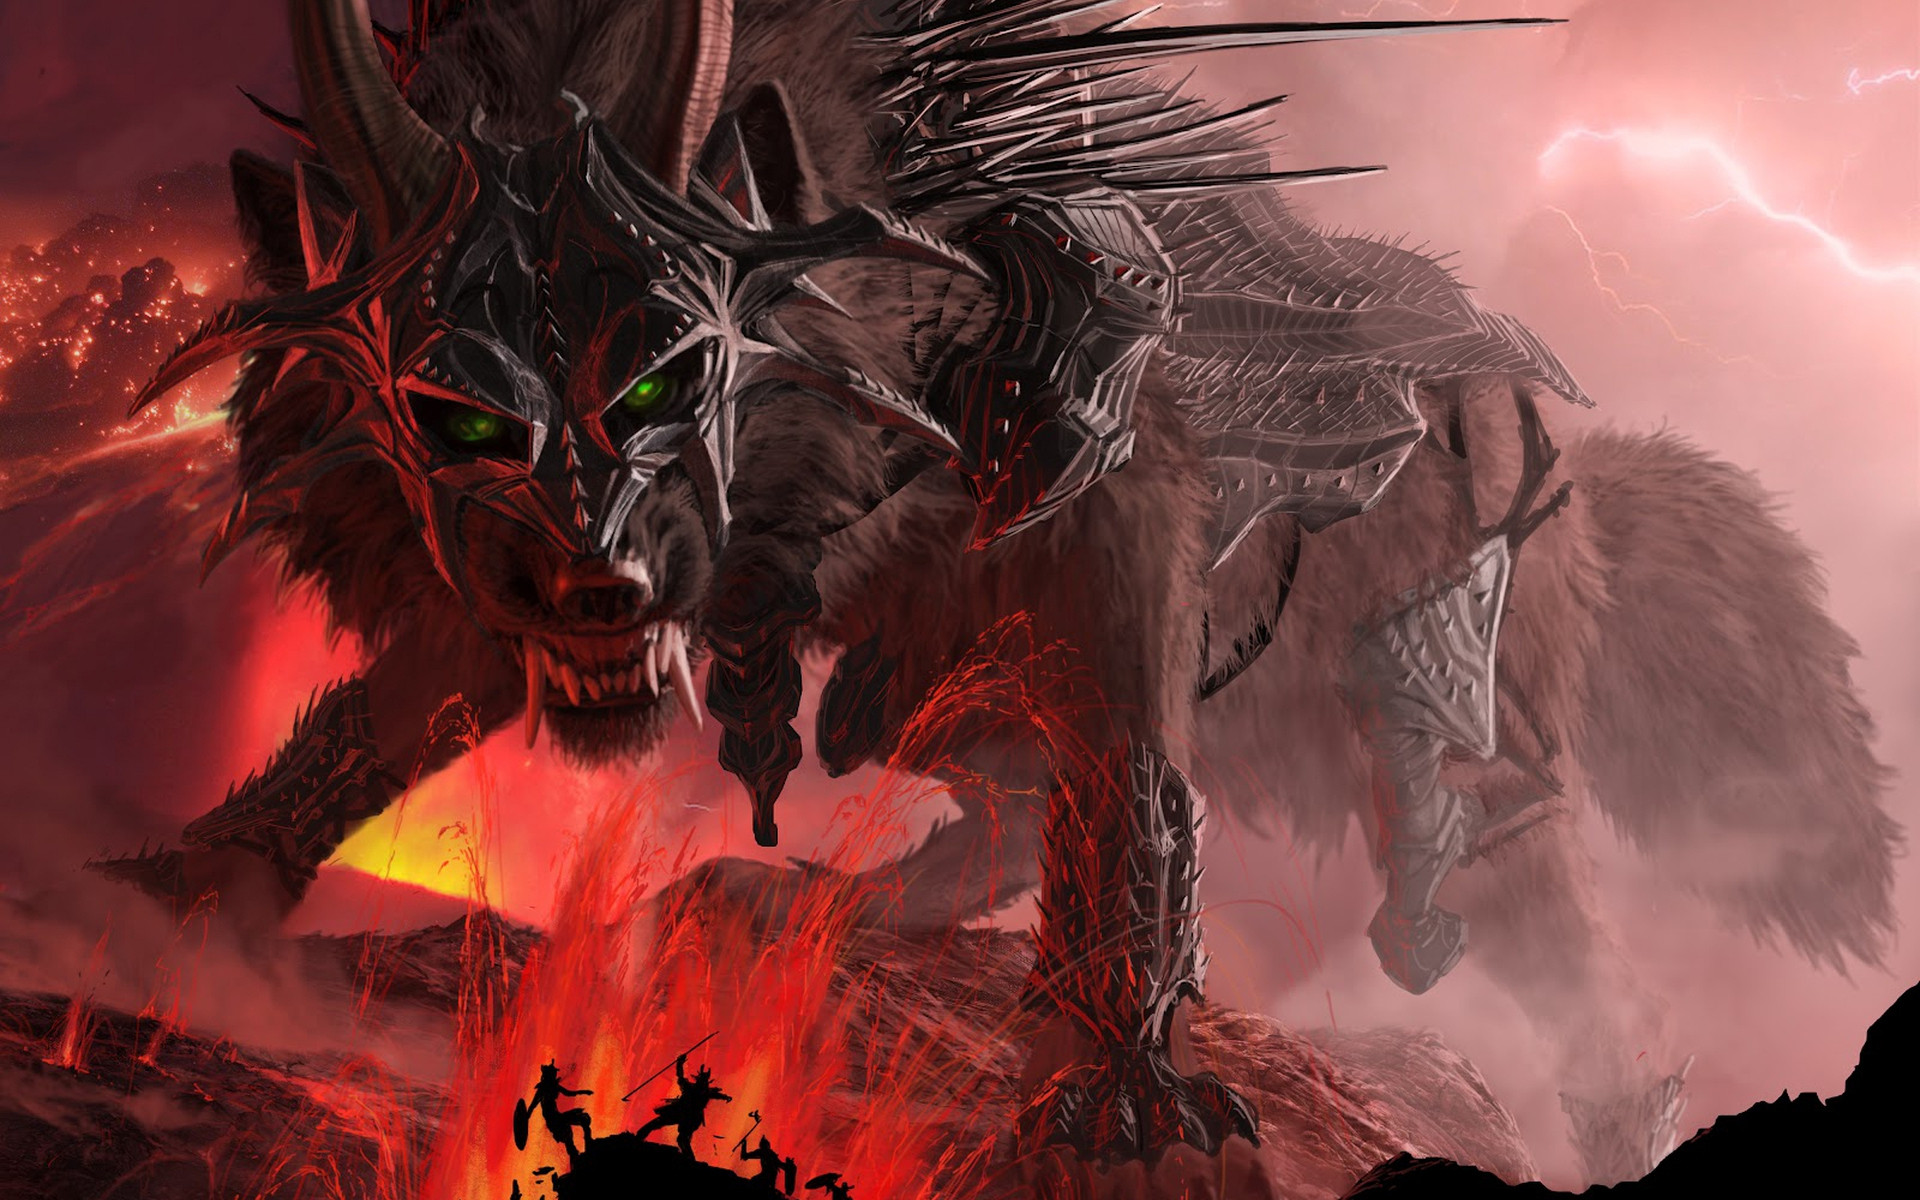 Wolf Jaws Teeth Horns Armor Mountains Lava Lightning Wallpaper At Dark  Wallpapers